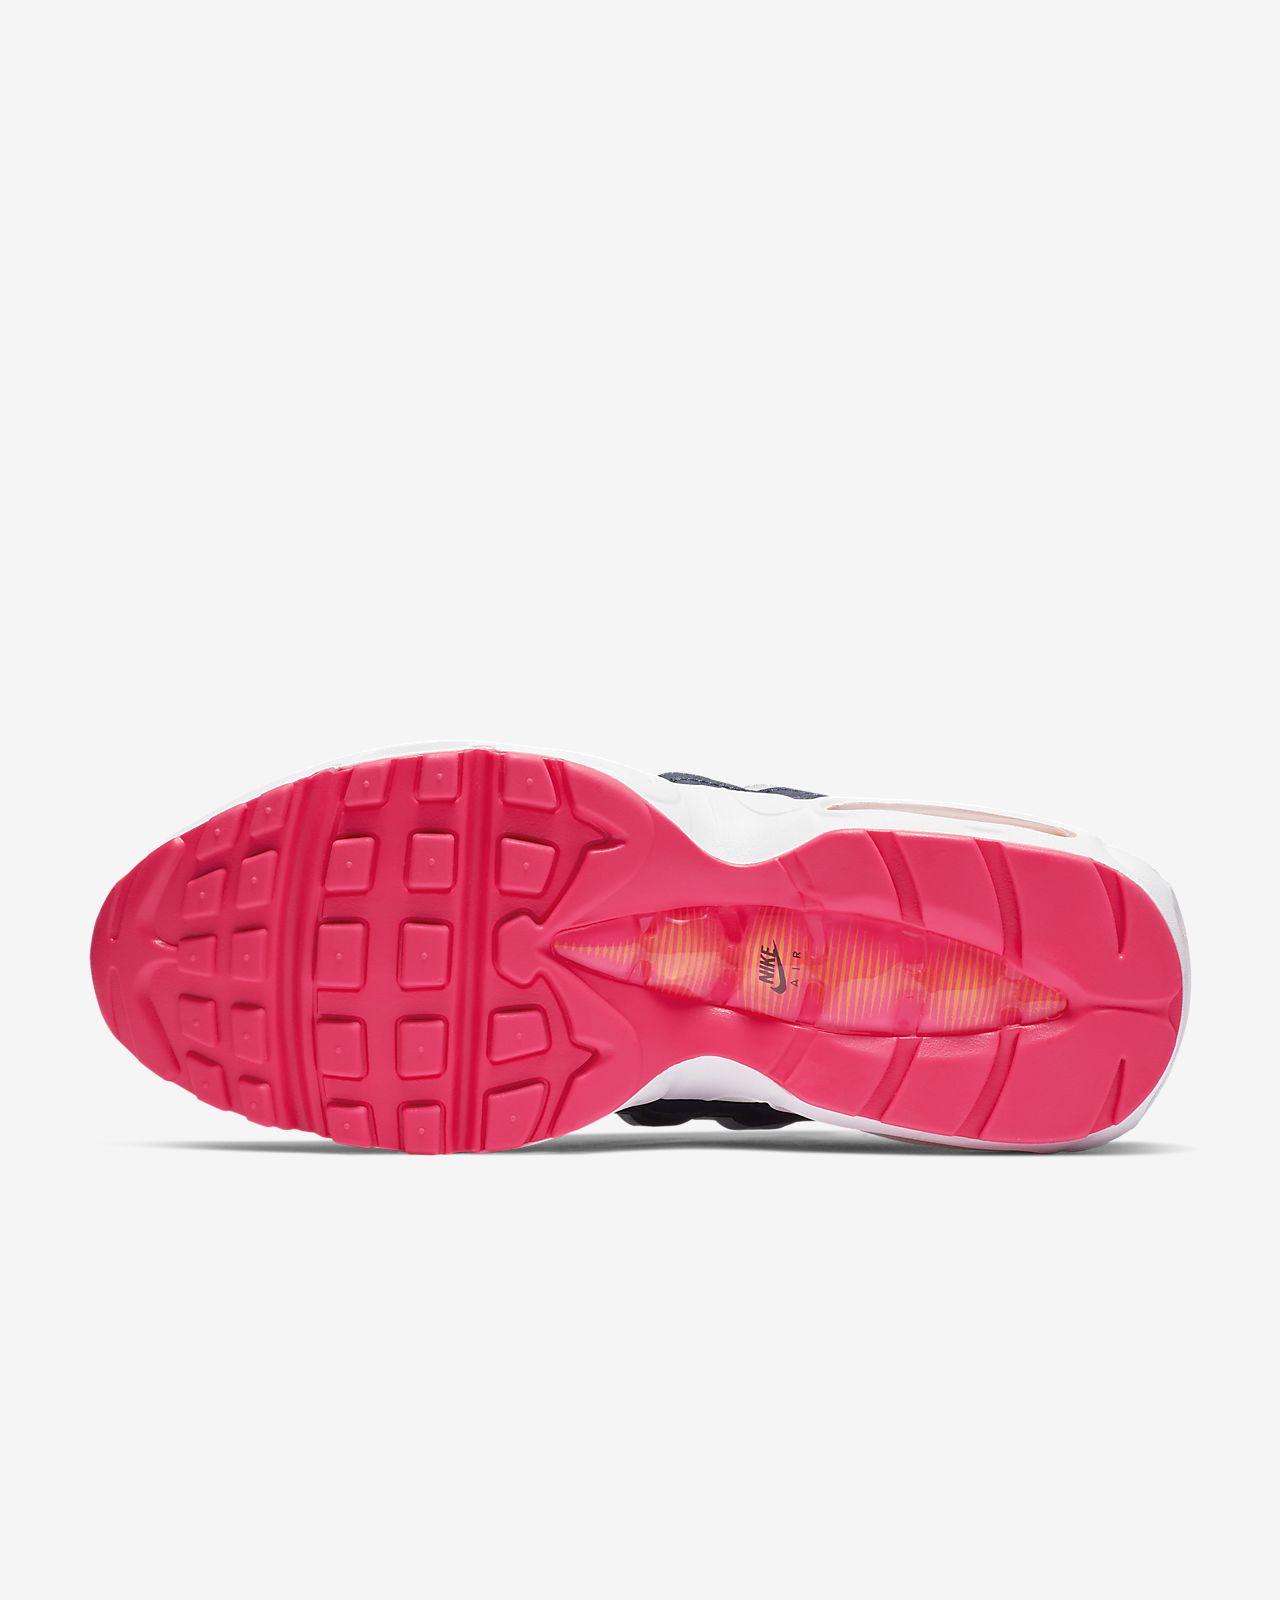 979caba9541bdb Nike Air Max 95 Premium Women s Shoe. Nike.com CA